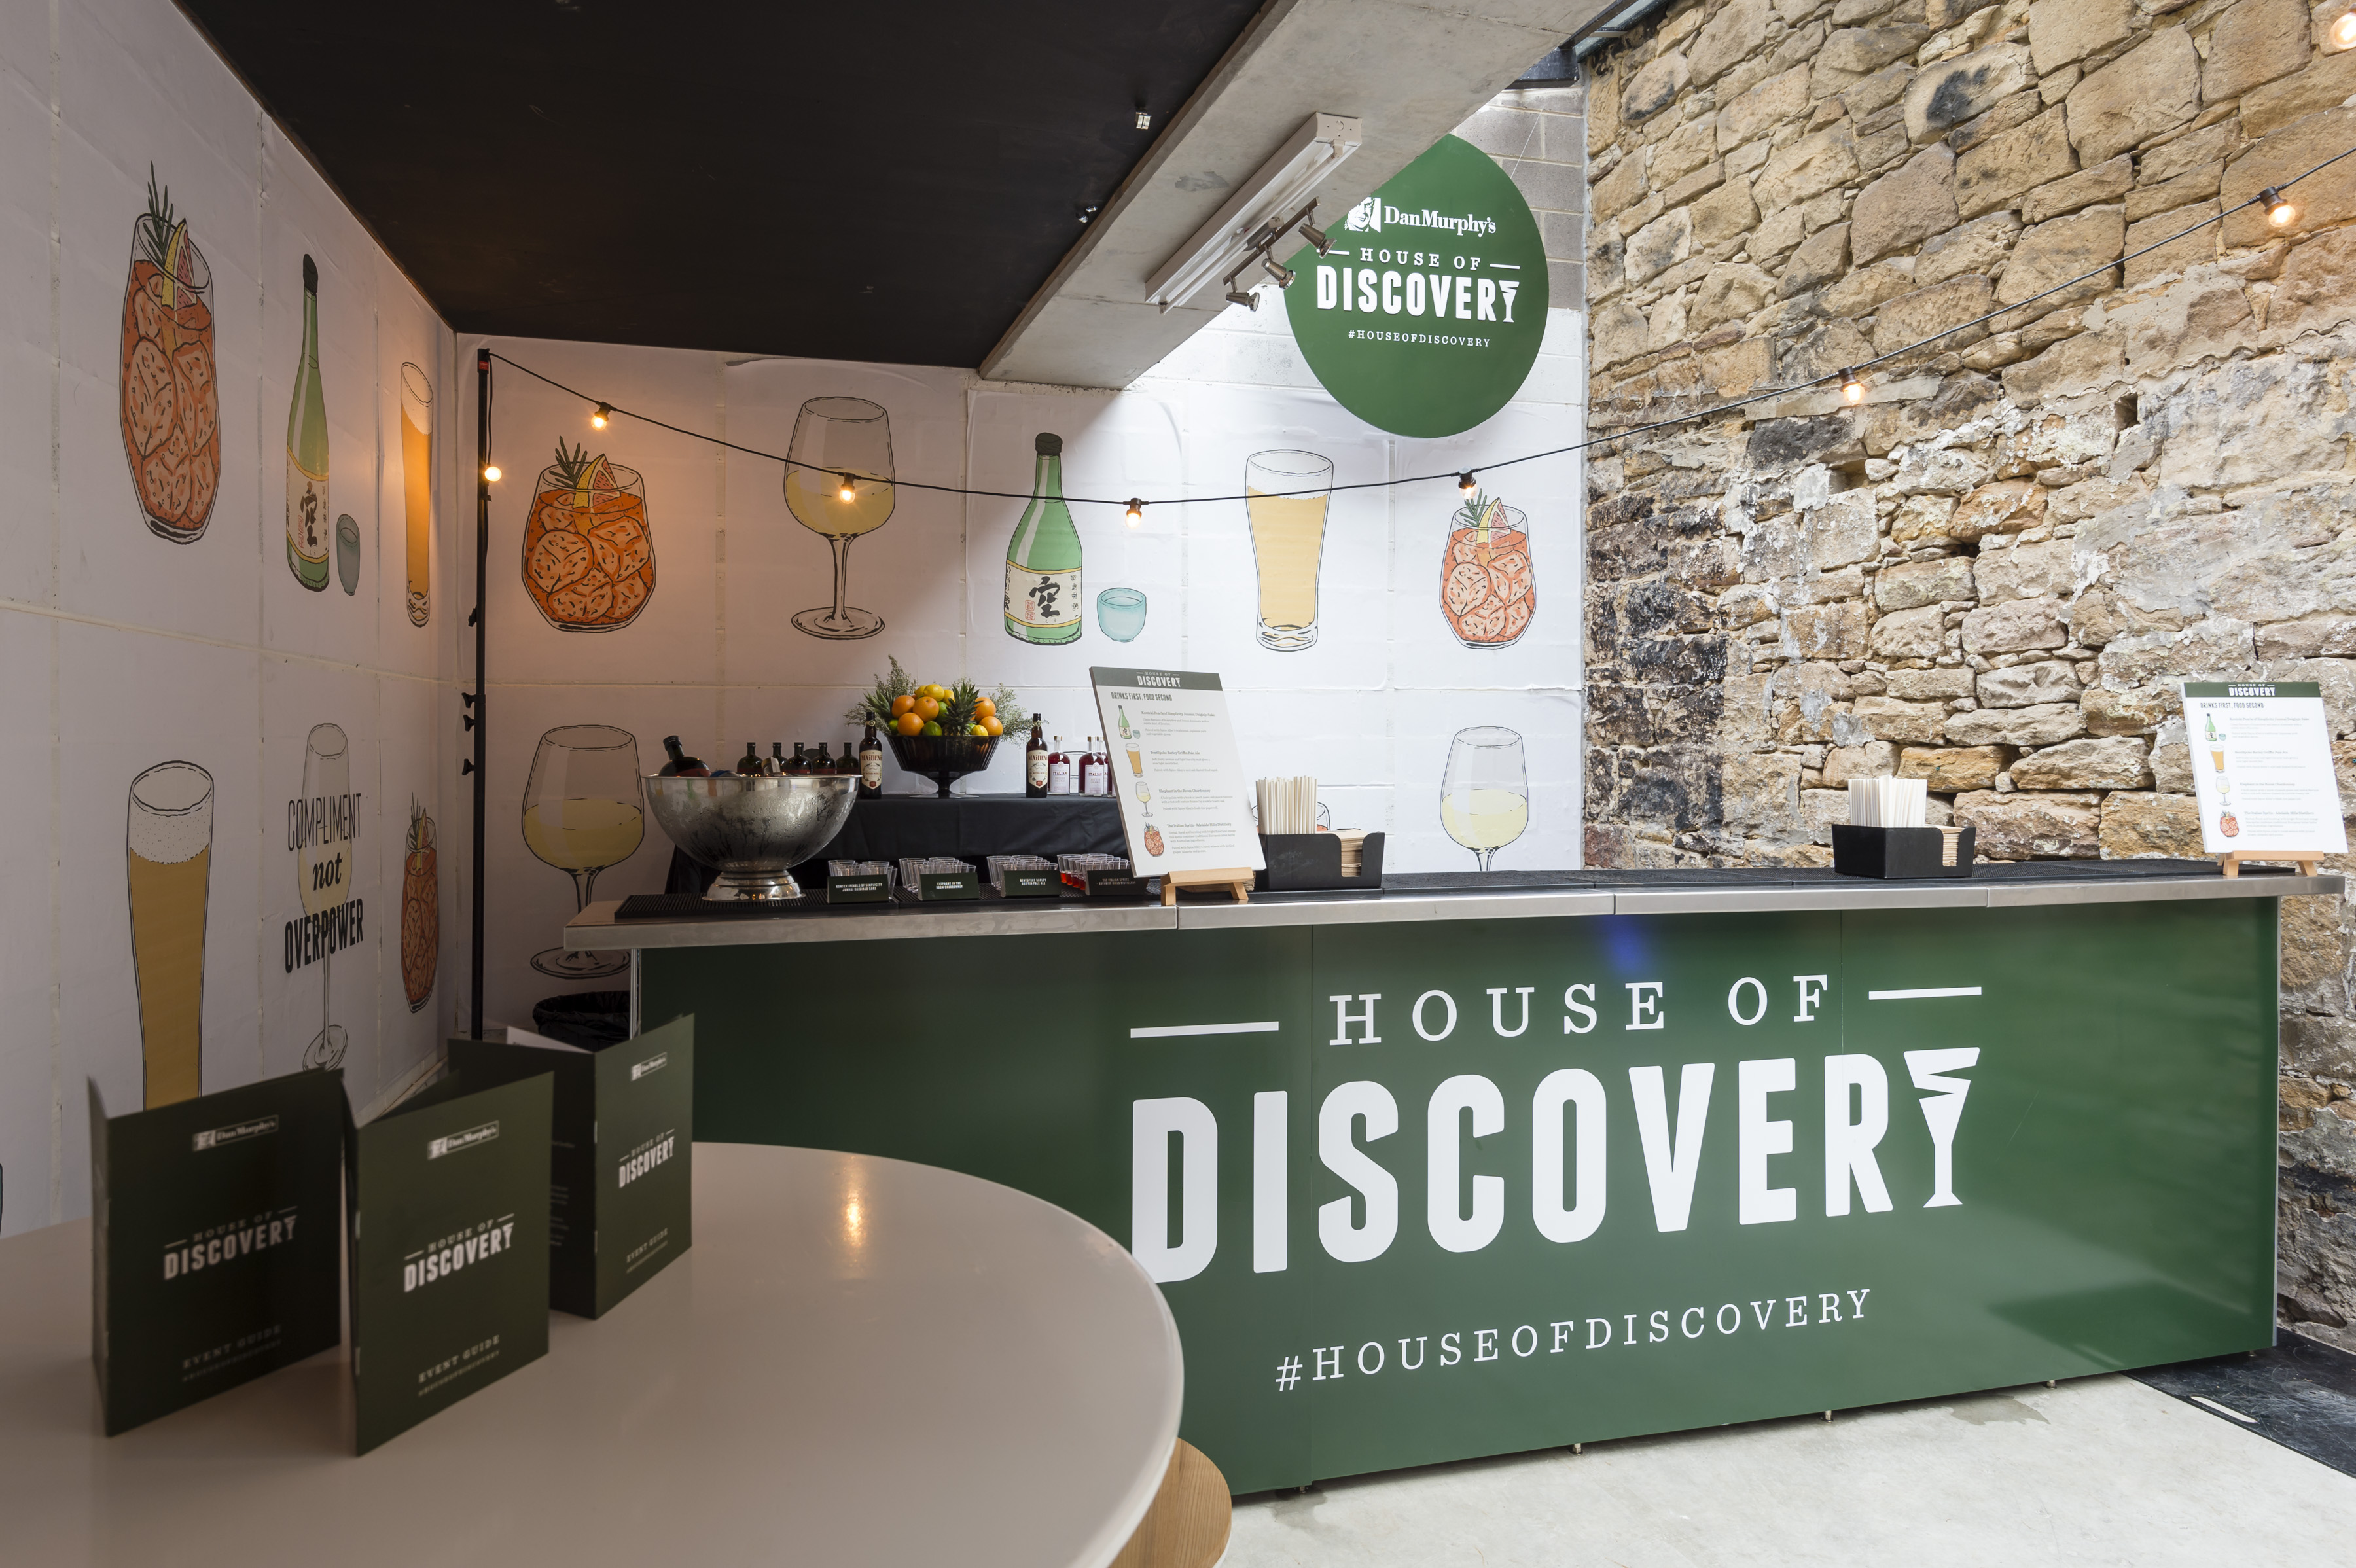 Dan Murphy's House of Discovery